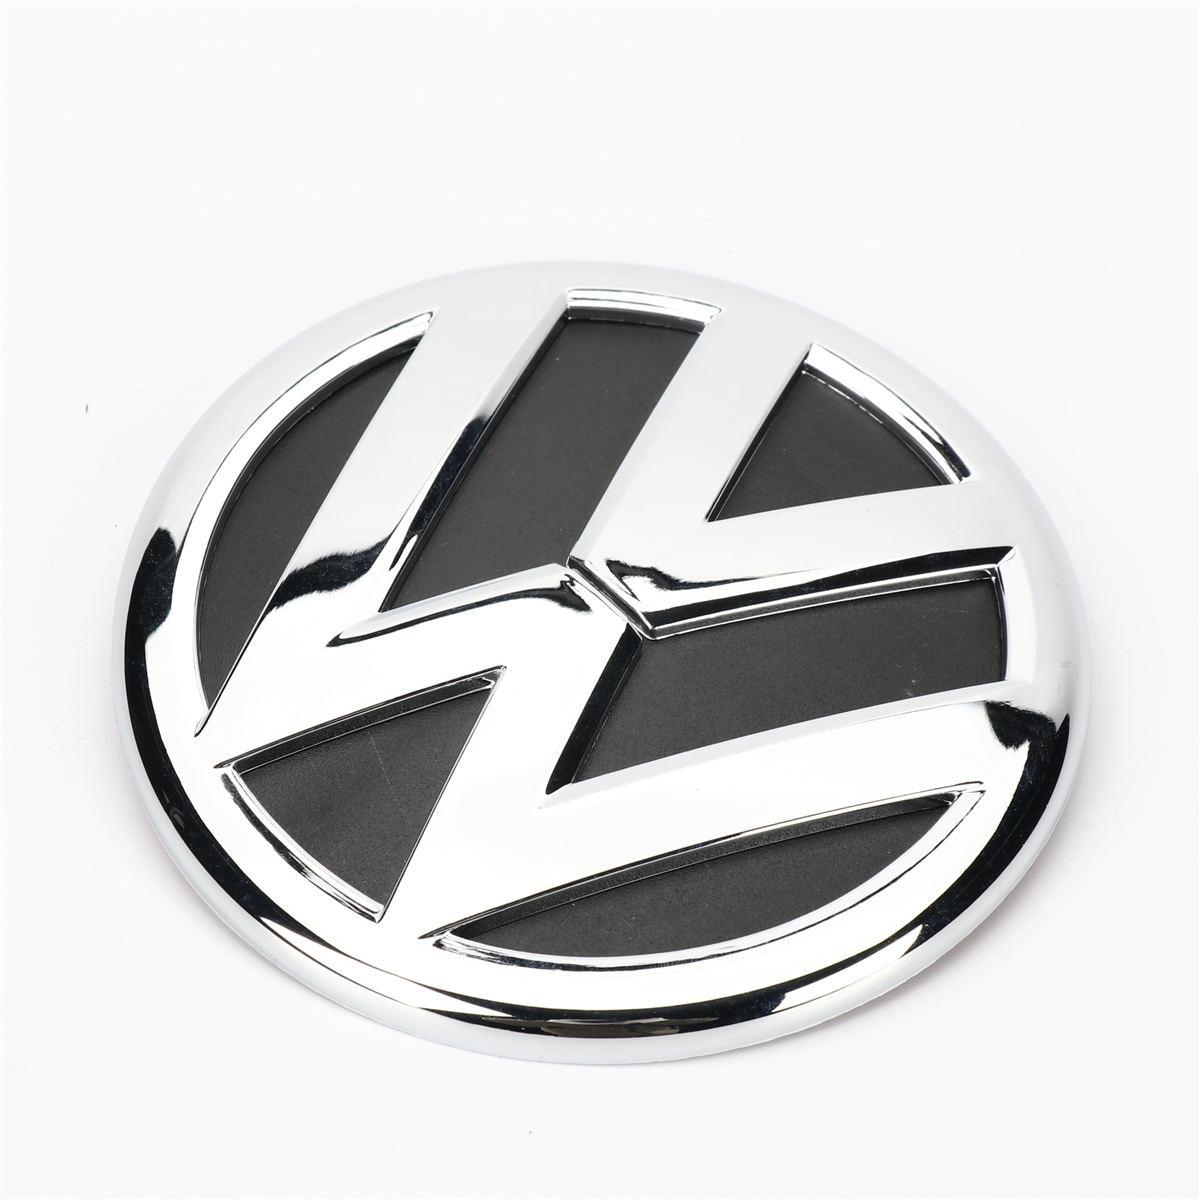 125mm Rear Badge Emblem Logo for VW Touareg 2011-2014 7P6 853 630 A ULM